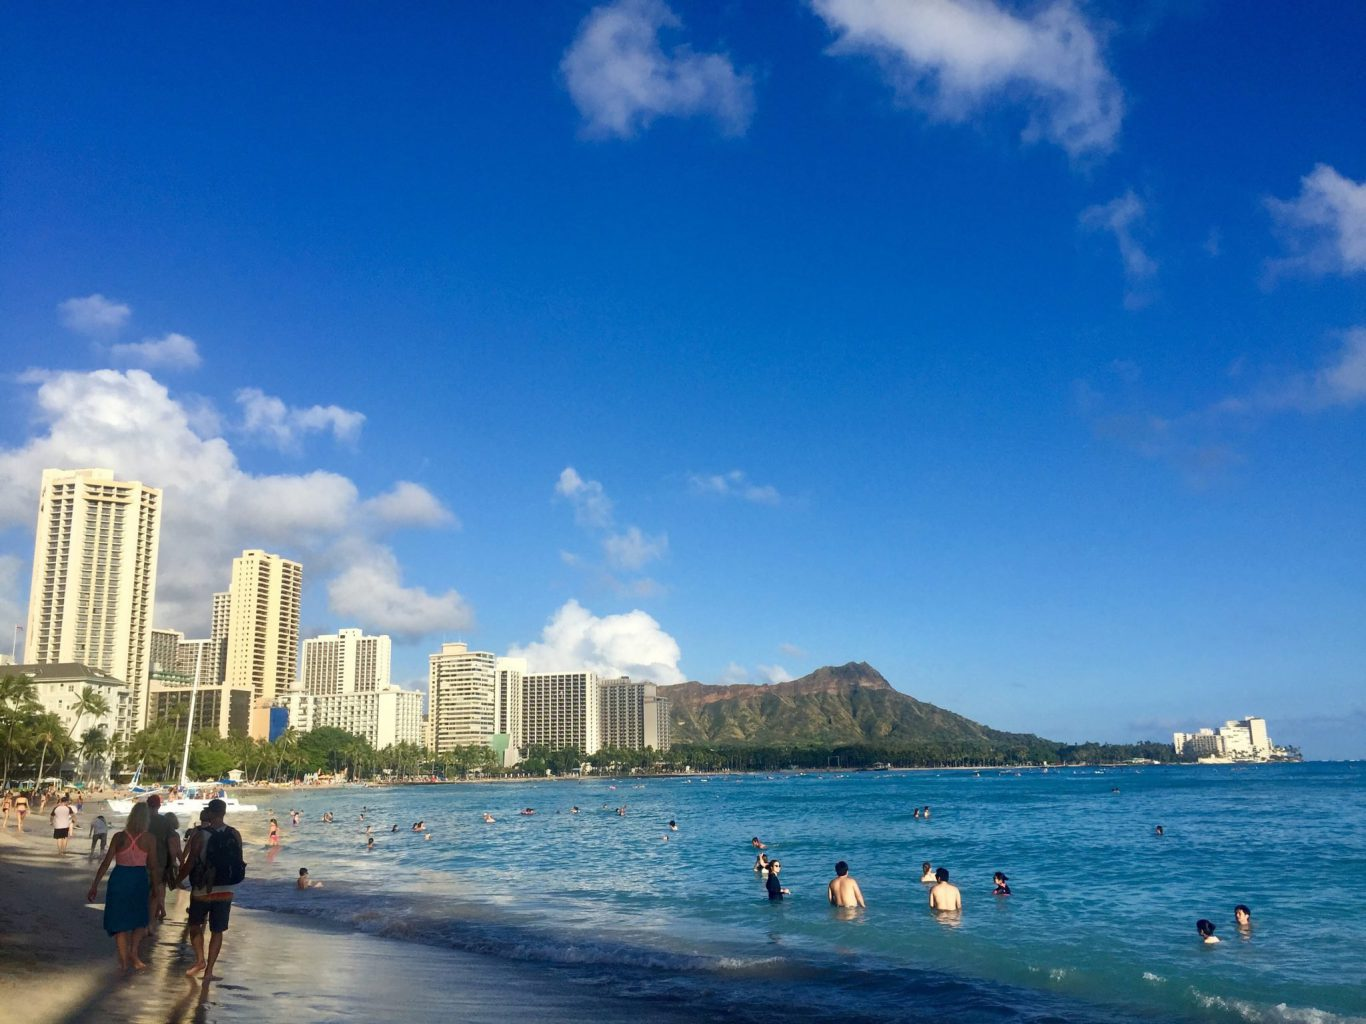 Planning a budget Hawaii vacation